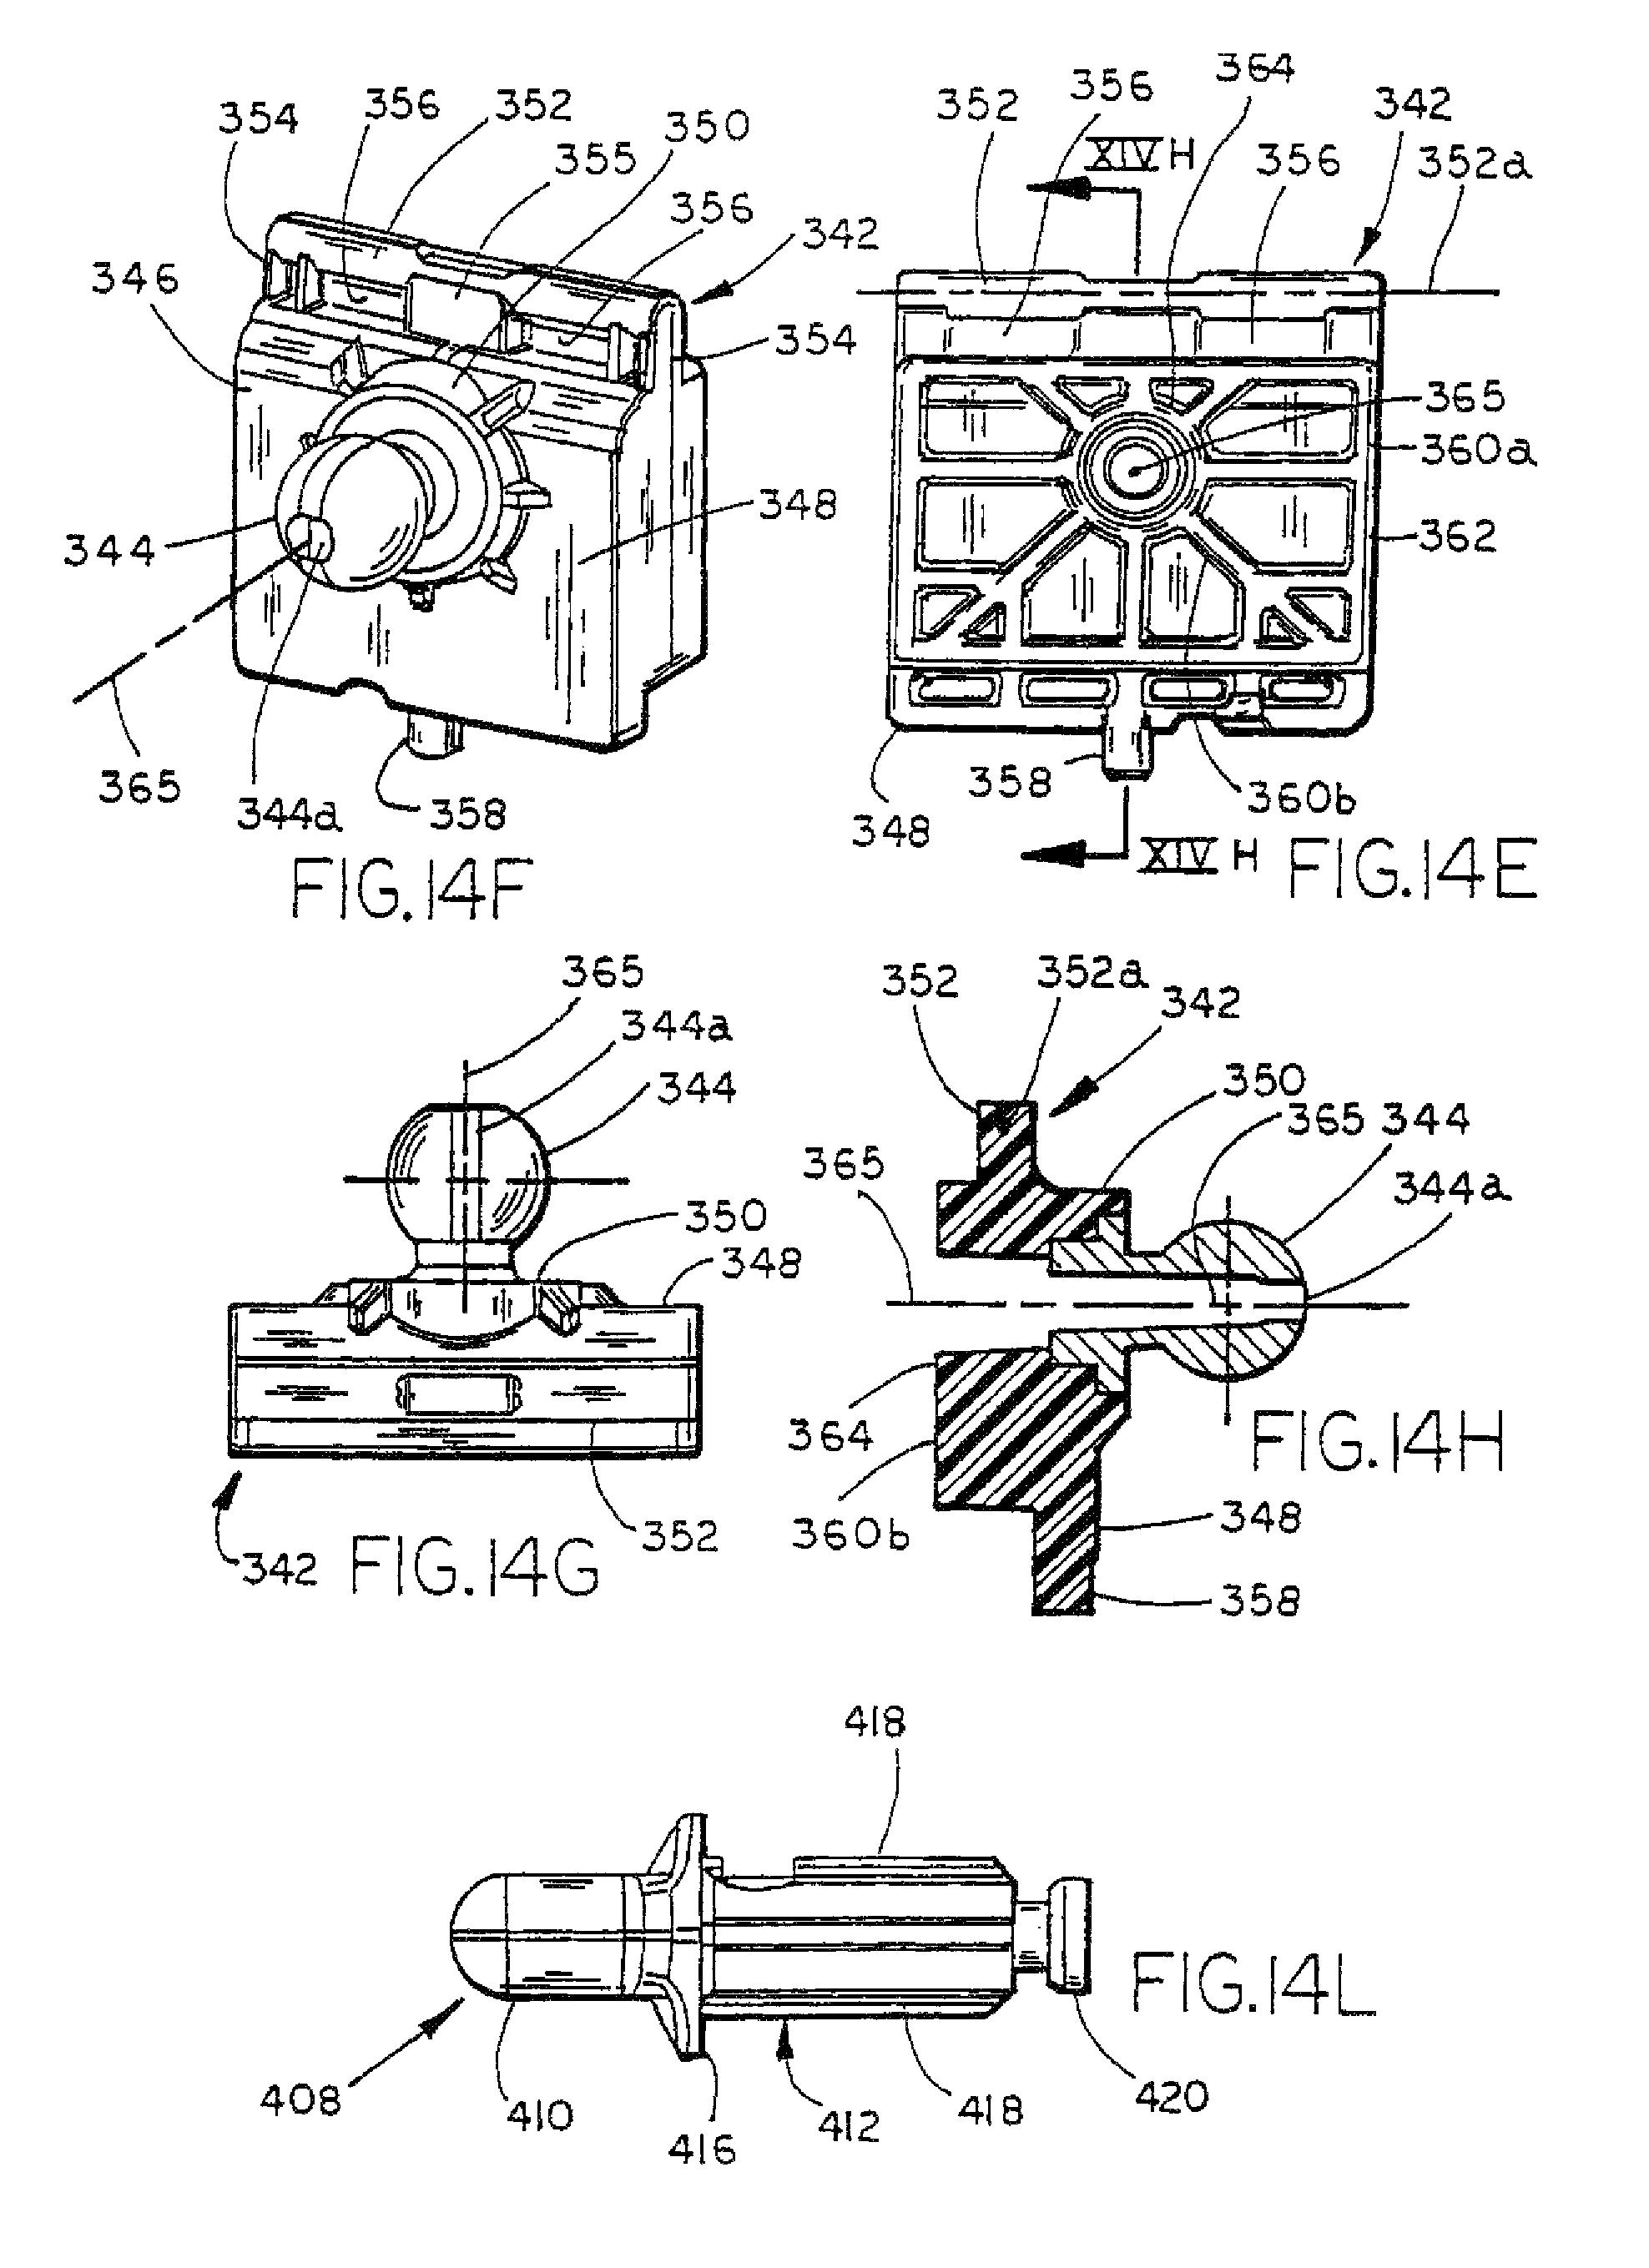 Patent Us 8162493 B2 Nissan Pathfinder Air Fuel Ratio Circuit Slow Response Bank 2 Sensor 0 Petitions